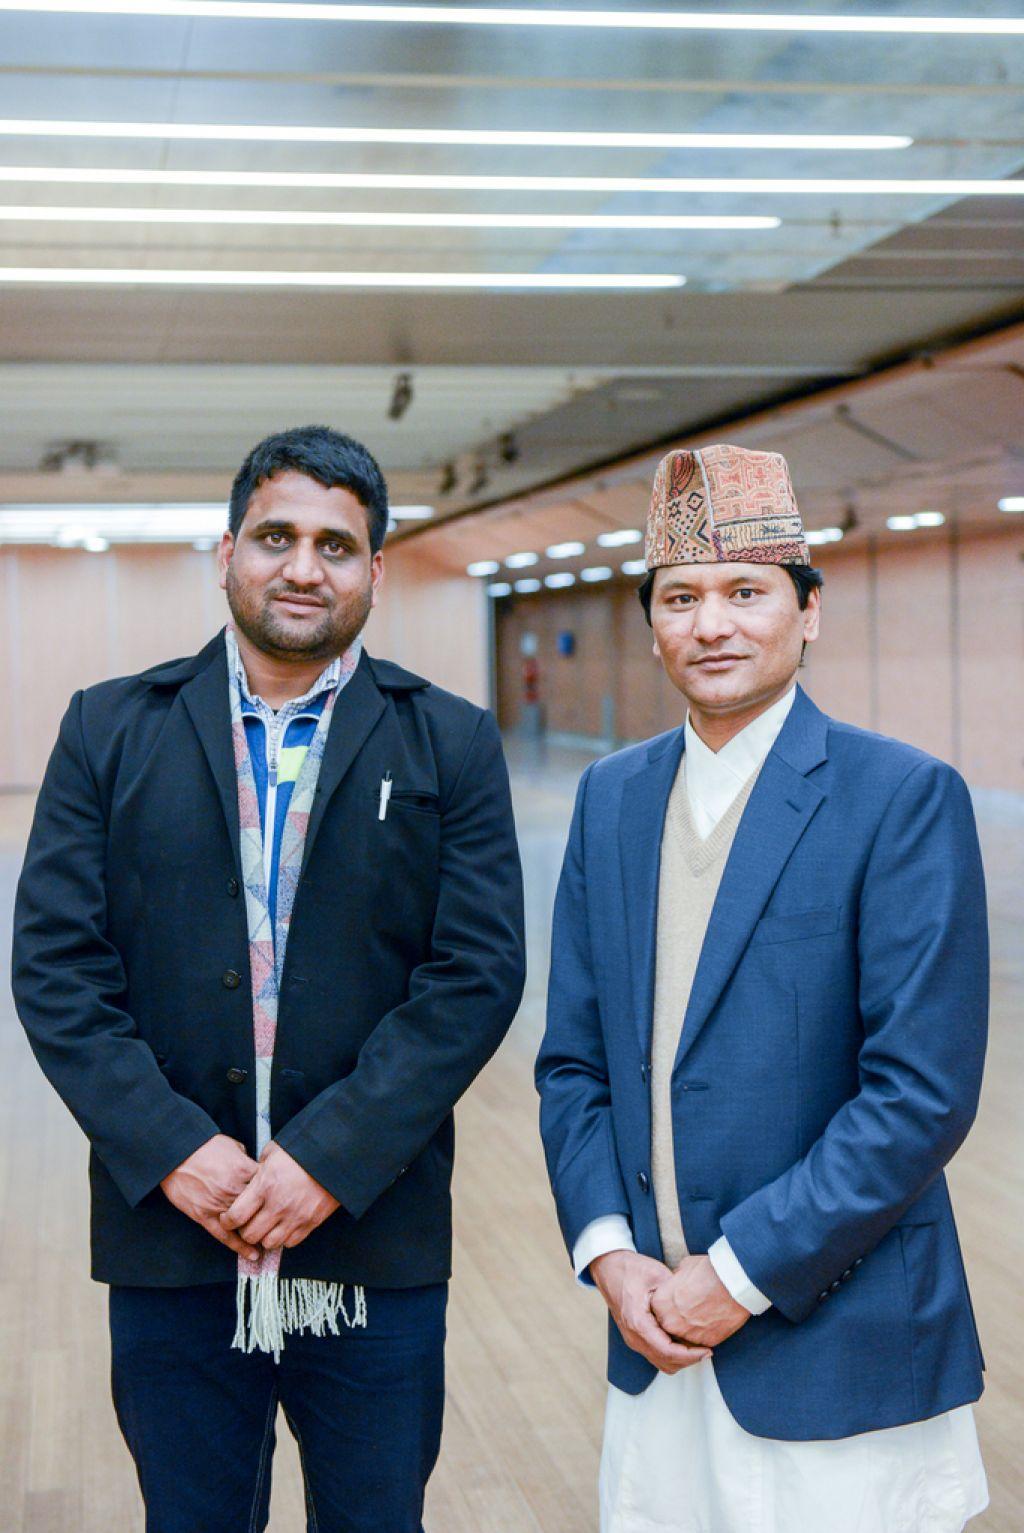 Nepalske nogometašice odkrile Messija v sebi